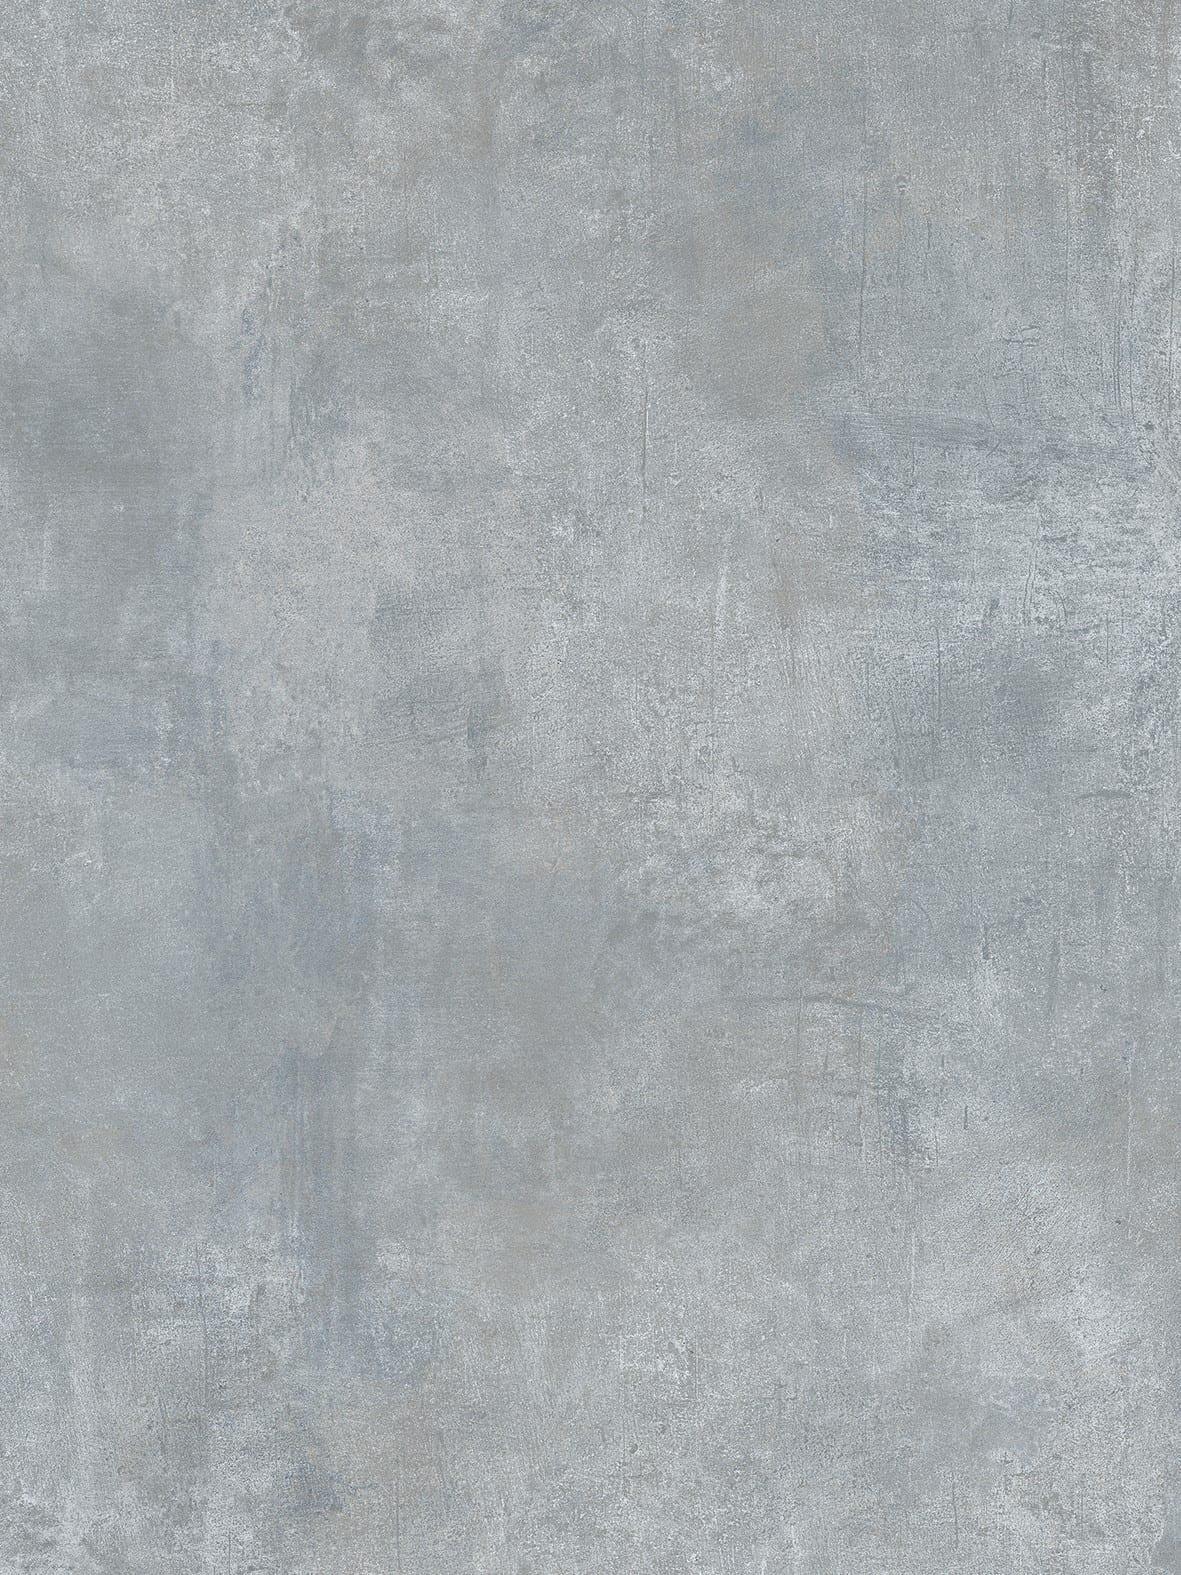 #11 - Cement Grey